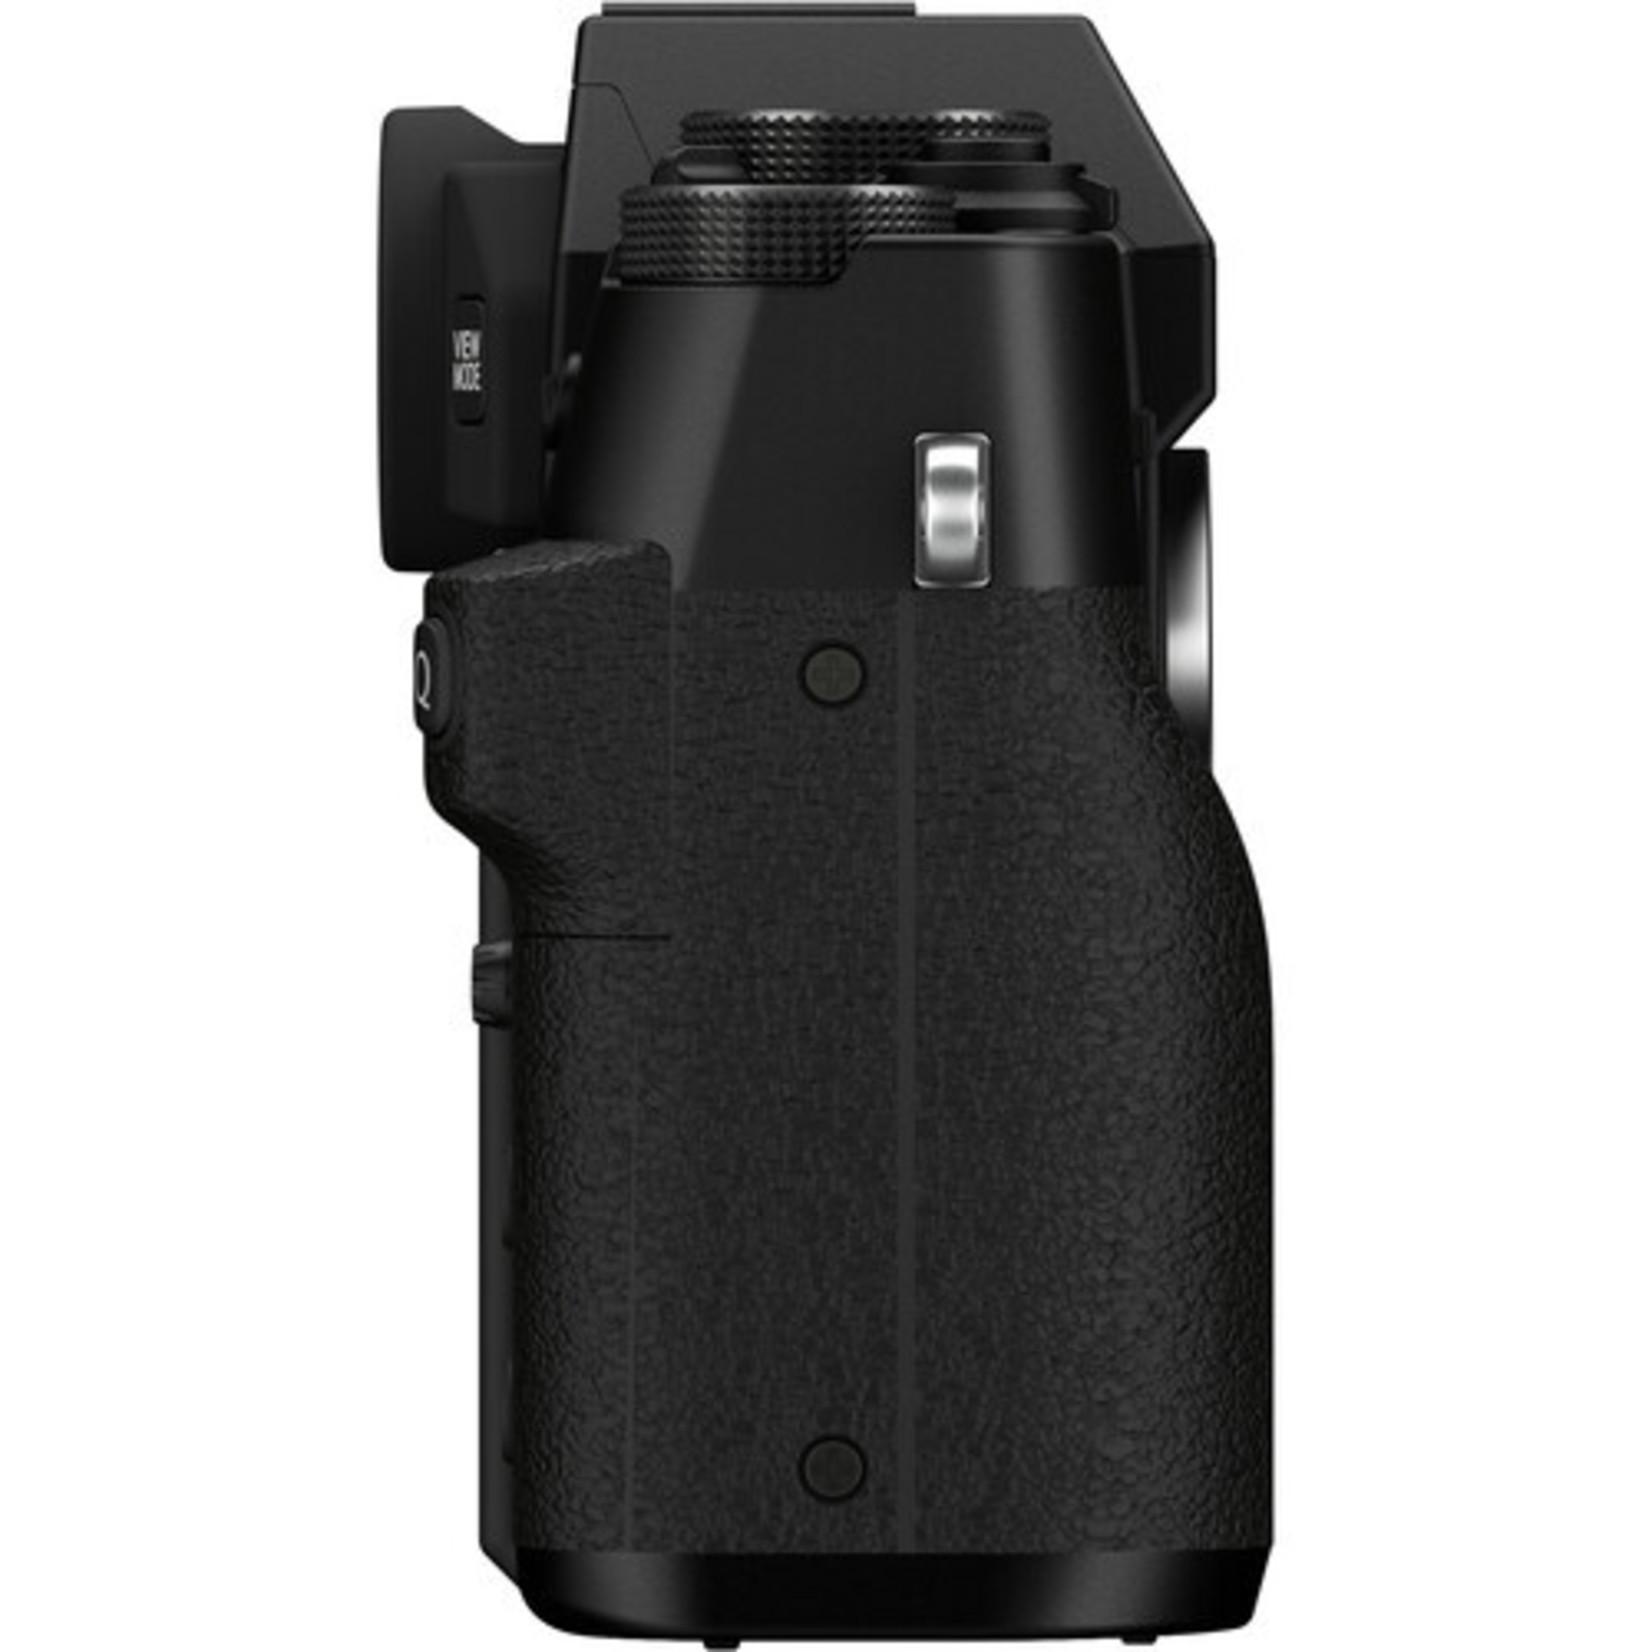 FujiFilm FUJIFILM X-T30 II Mirrorless Digital Camera (Body Only, Black)